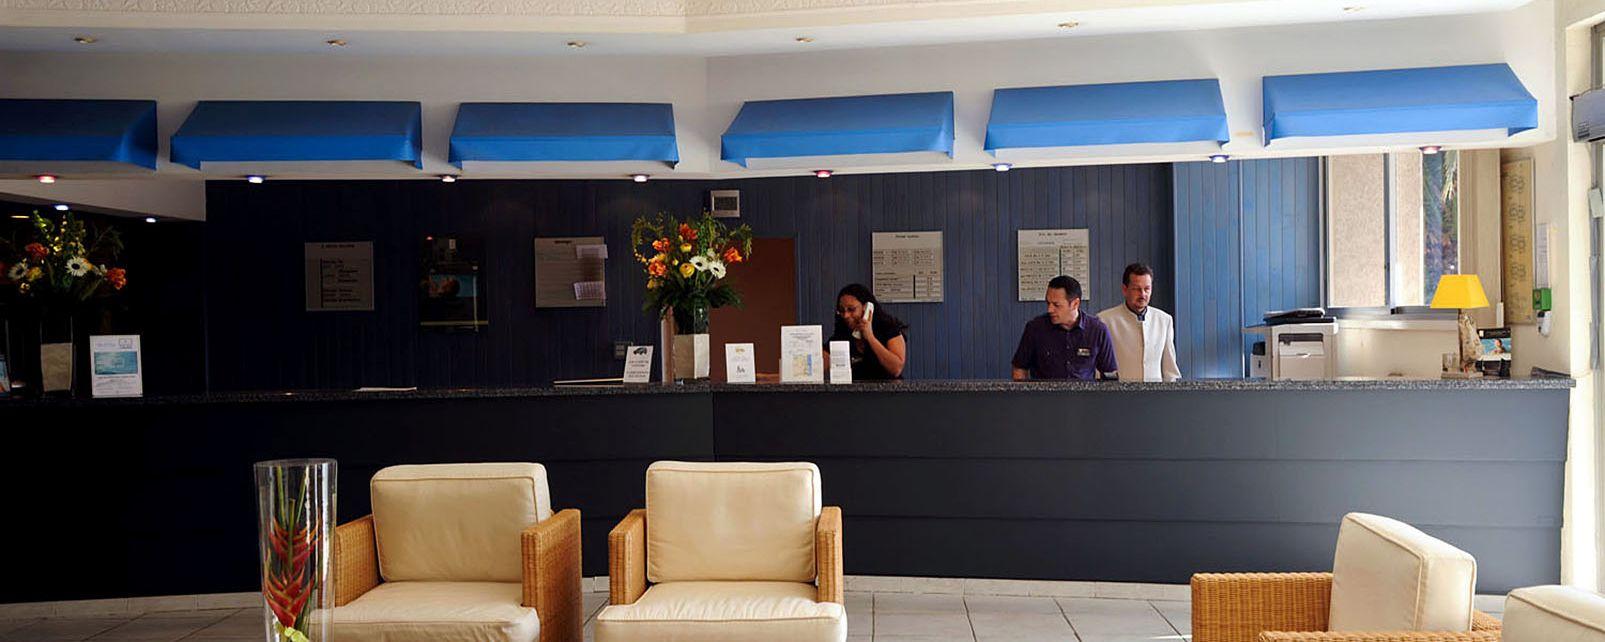 Hotel Baie des Anges (Antibes, France) - Avis Spa - TripAdvisor